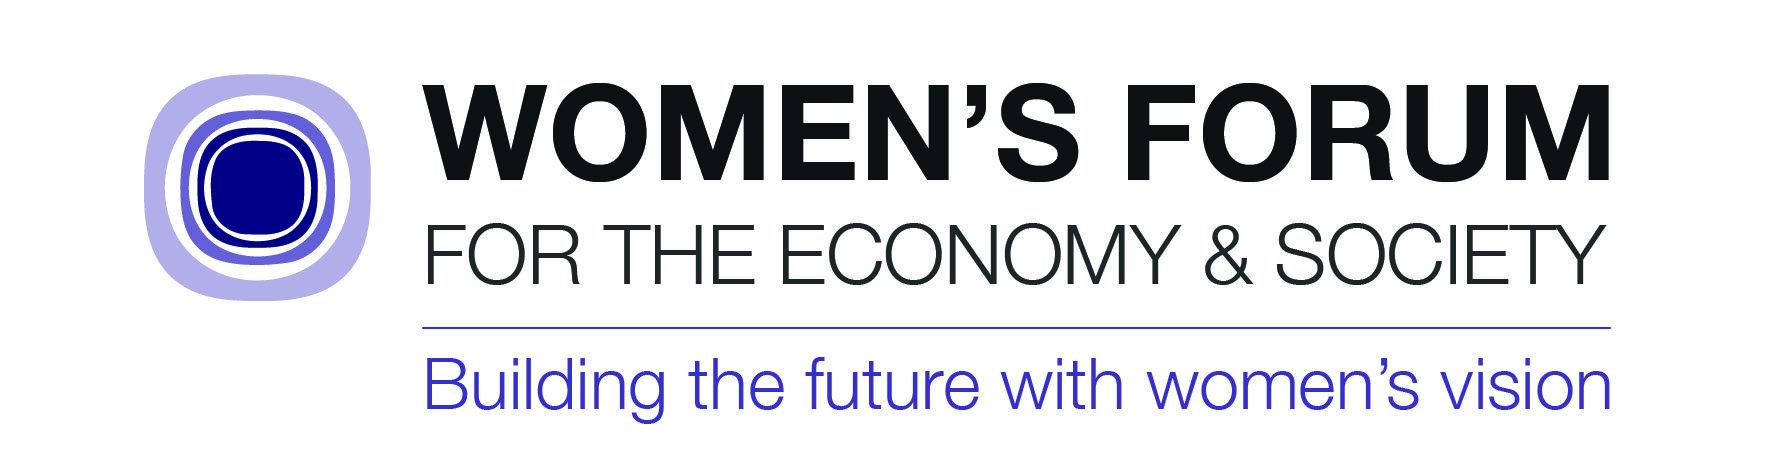 Women'sforum_logo.jpg